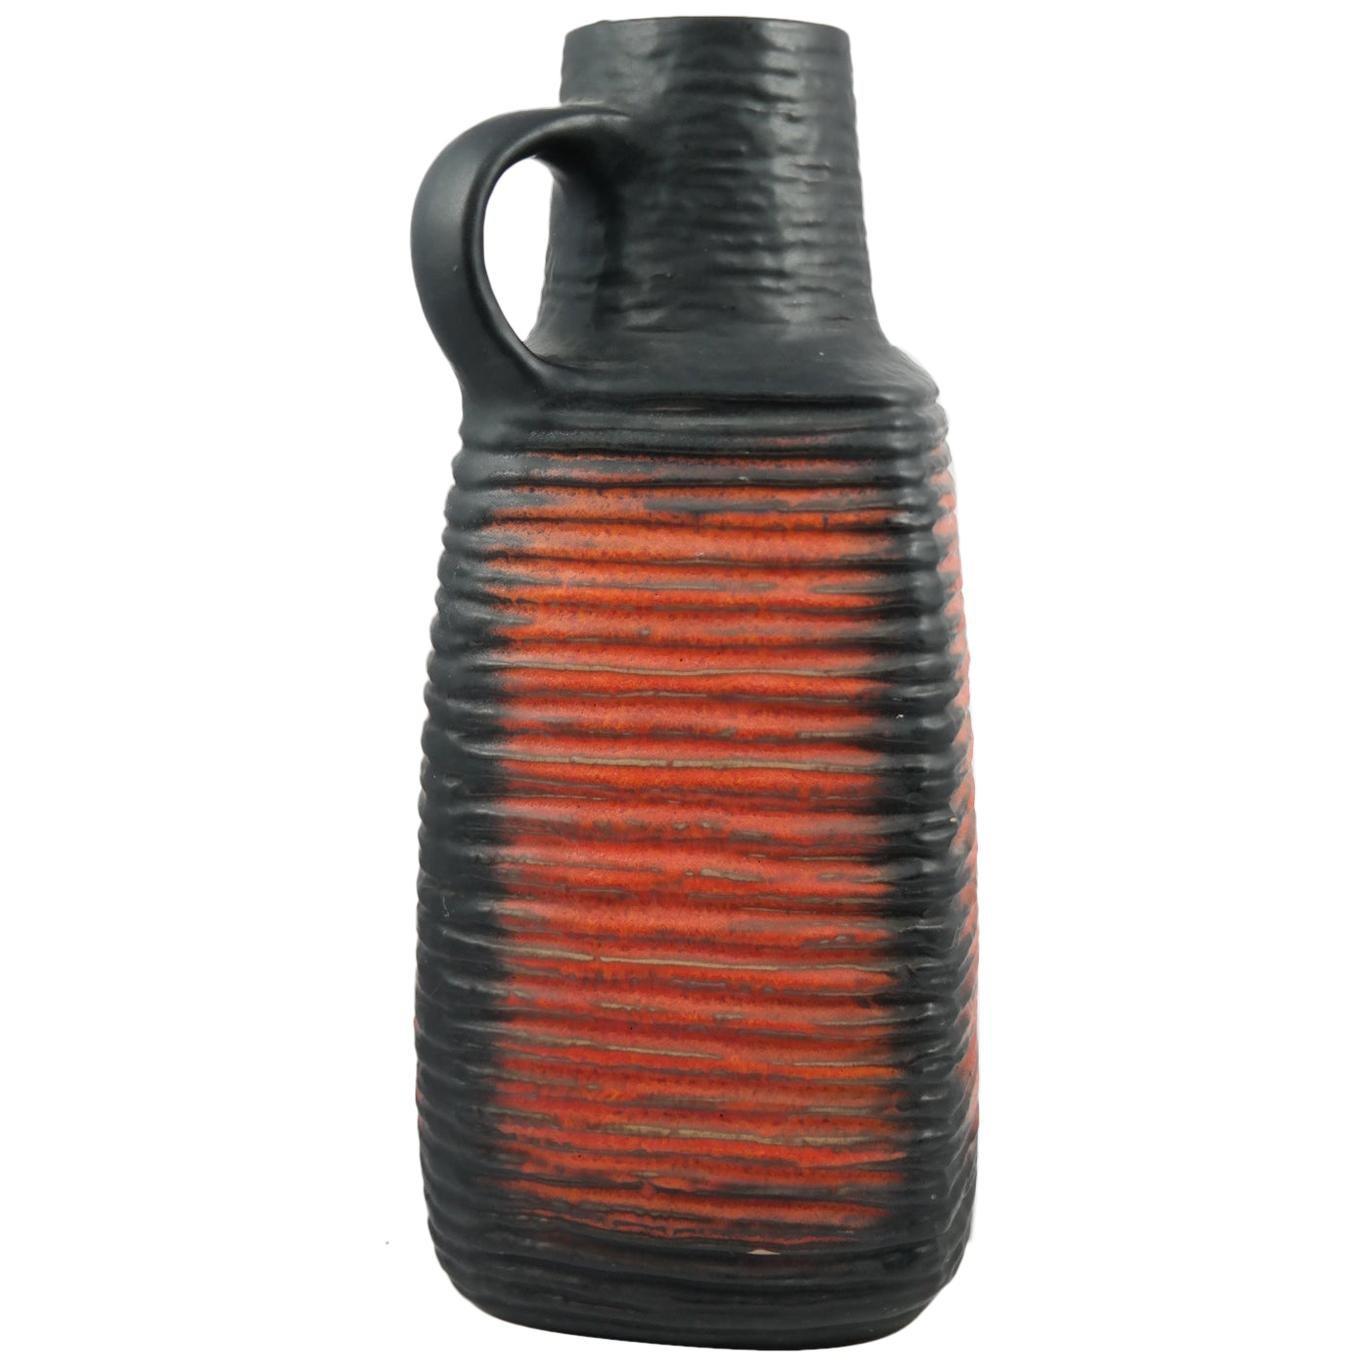 Large Midcentury Handmade Ceramic Vase, 1970s